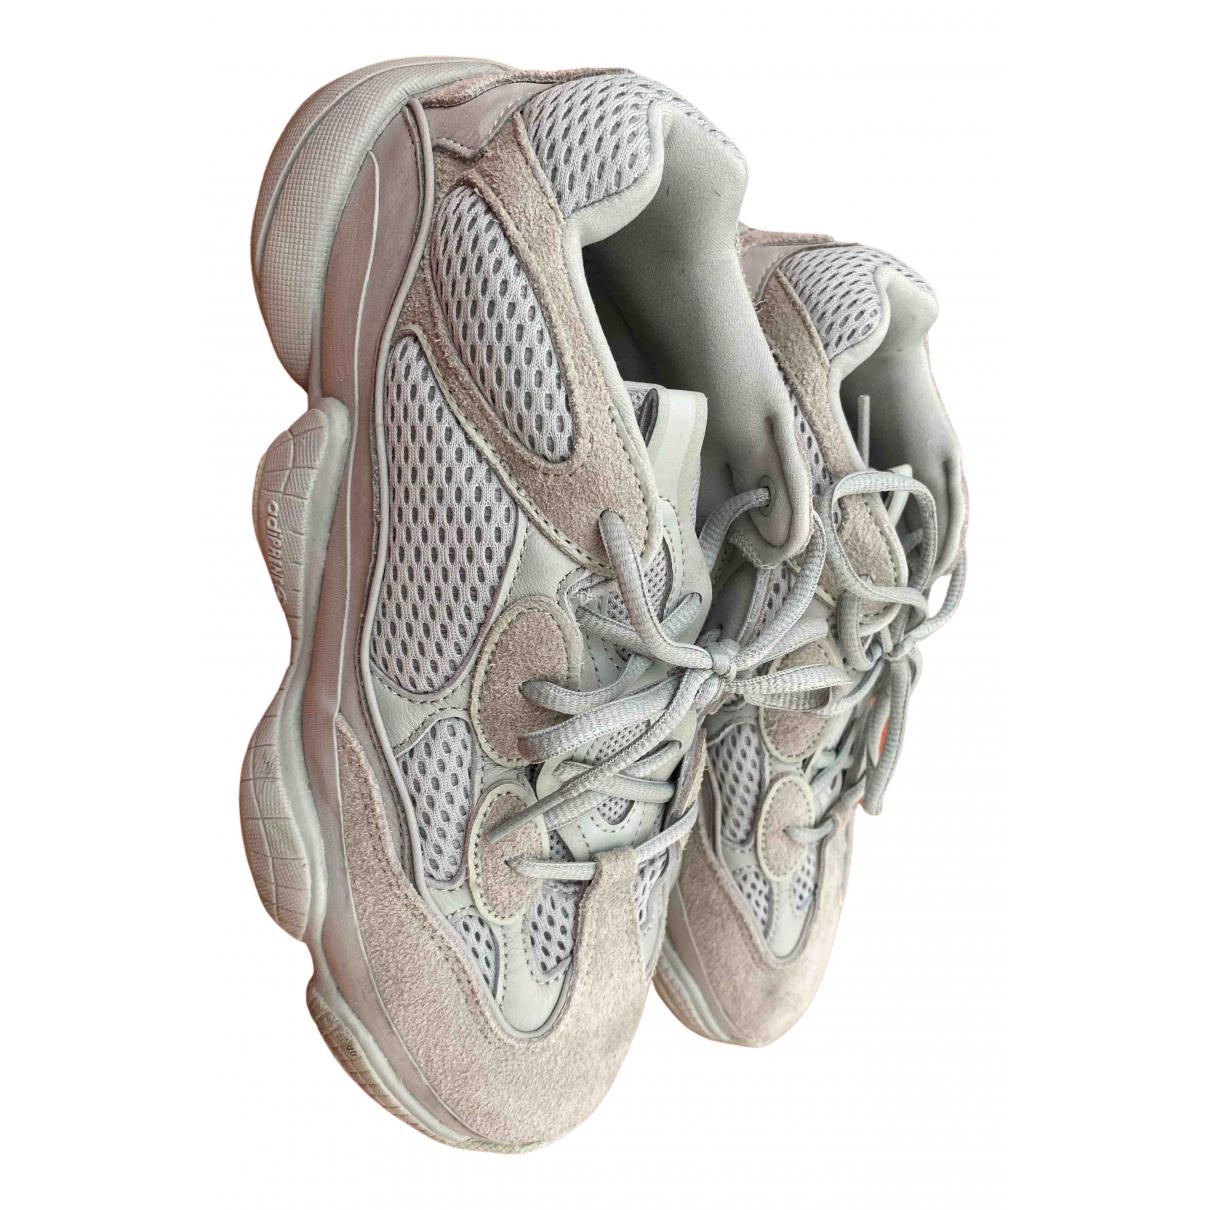 Yeezy X Adidas - Baskets 500 pour homme en cuir - blanc